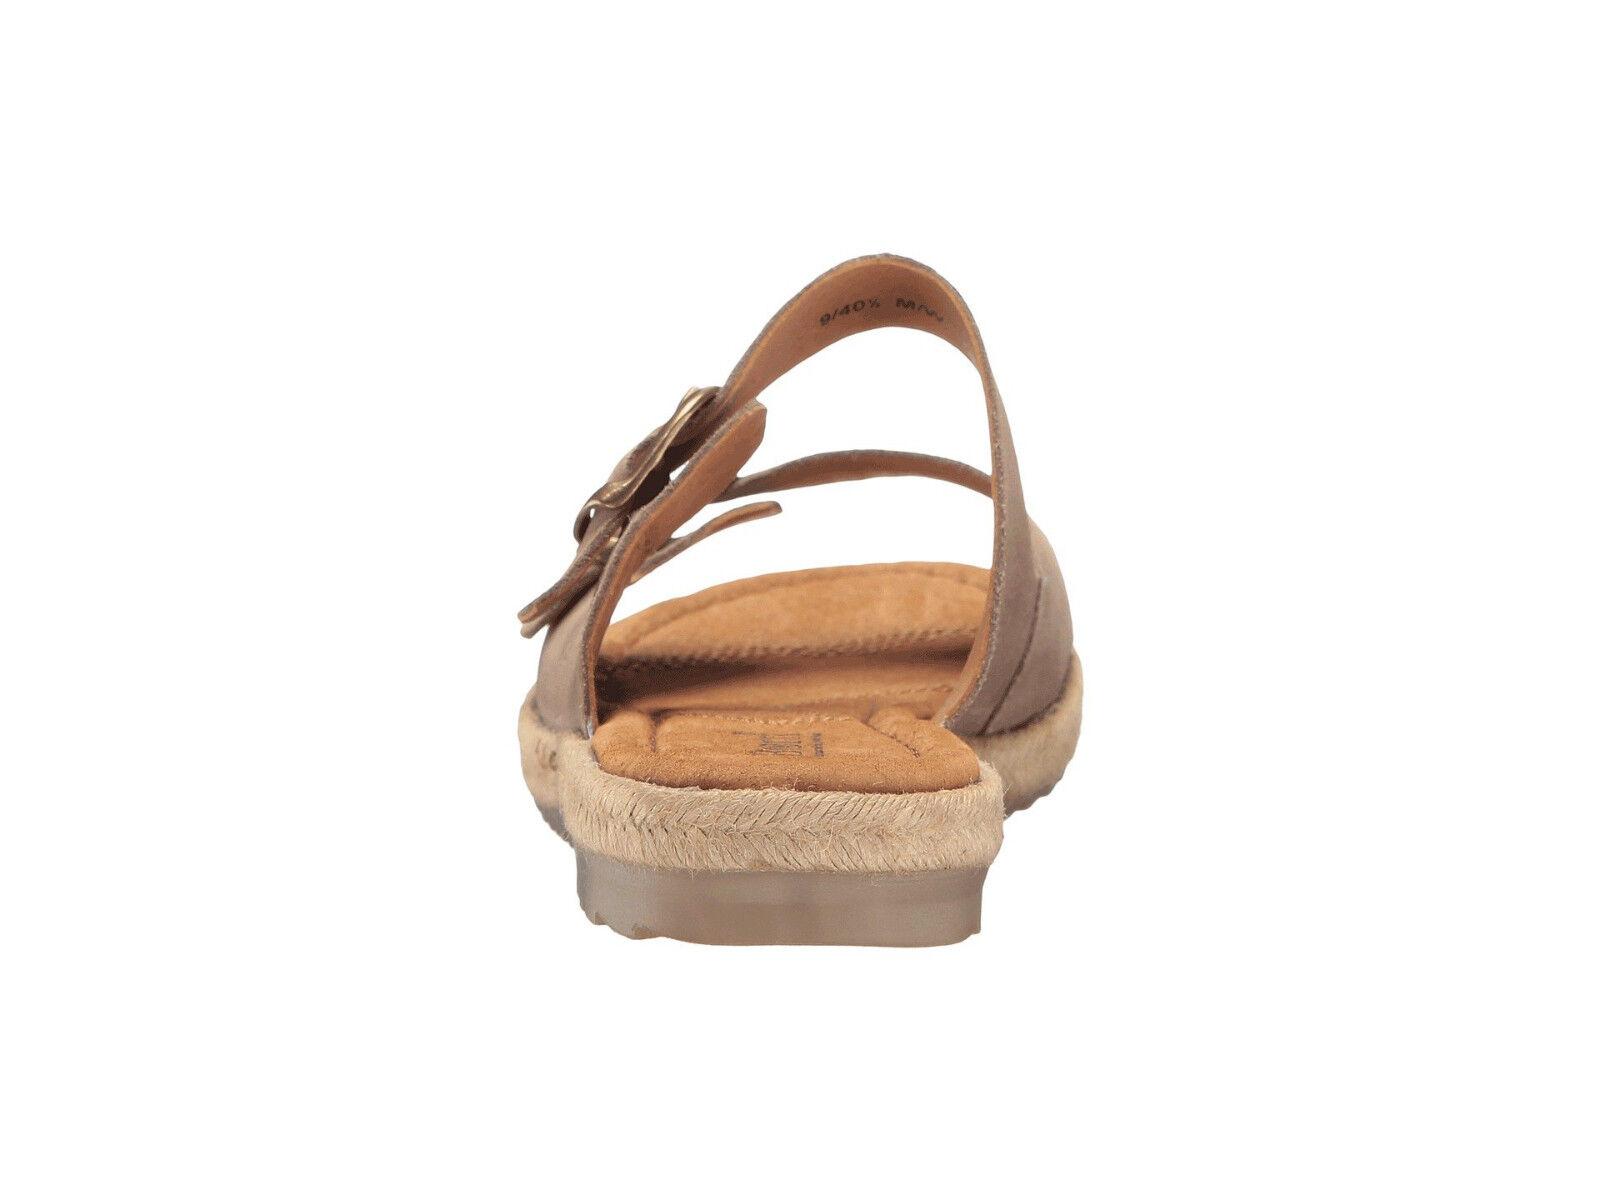 Born donna Votua Open Toe Leather Fashion Casual Dress Buckle Buckle Buckle Slides Sandals bd2f17